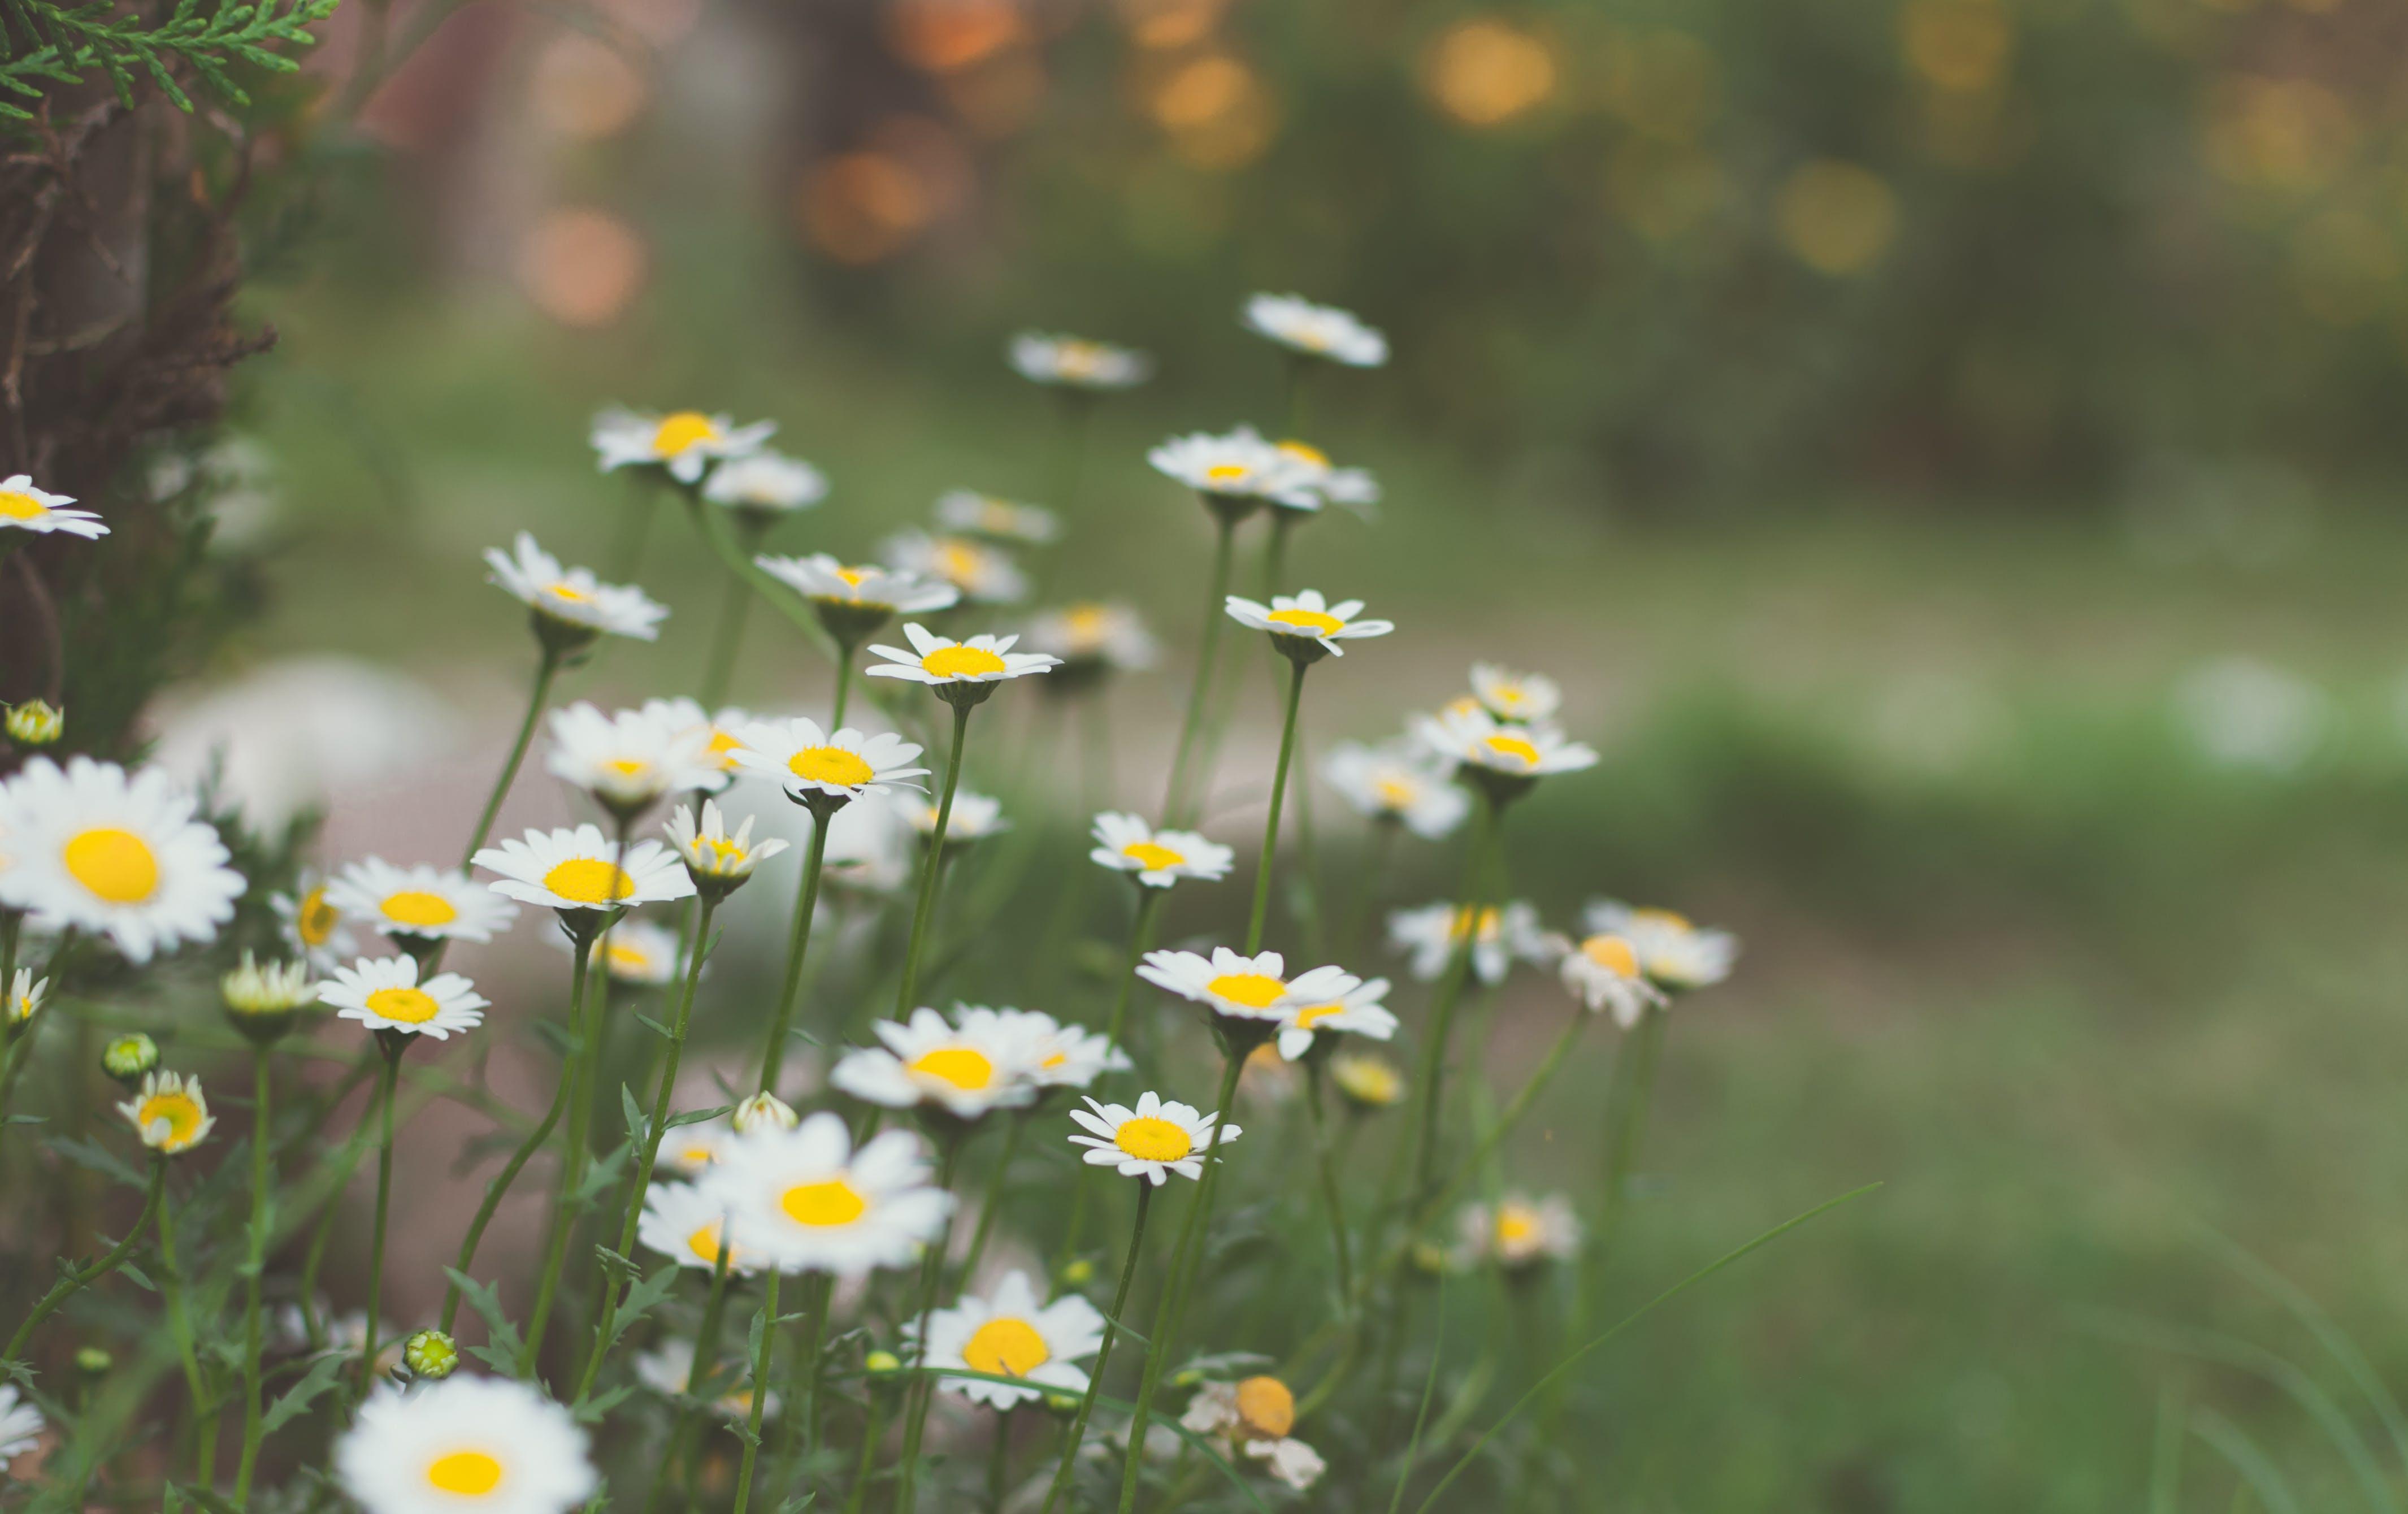 Free stock photo of beautiful flowers, bunch of flowers, flower wallpaper, HD wallpaper